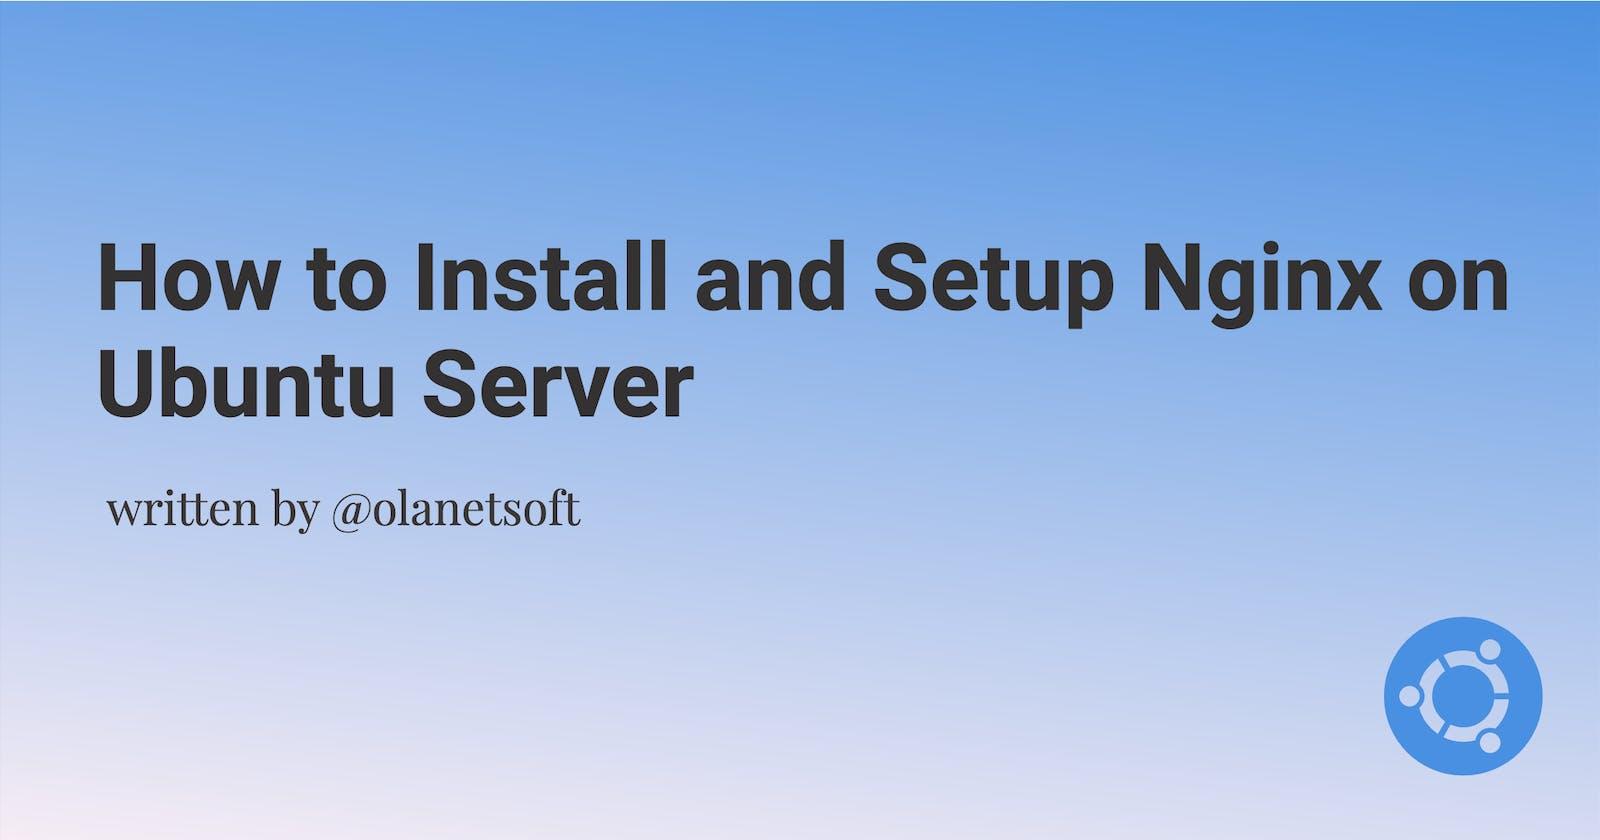 How to Install and Setup Nginx on Ubuntu Server